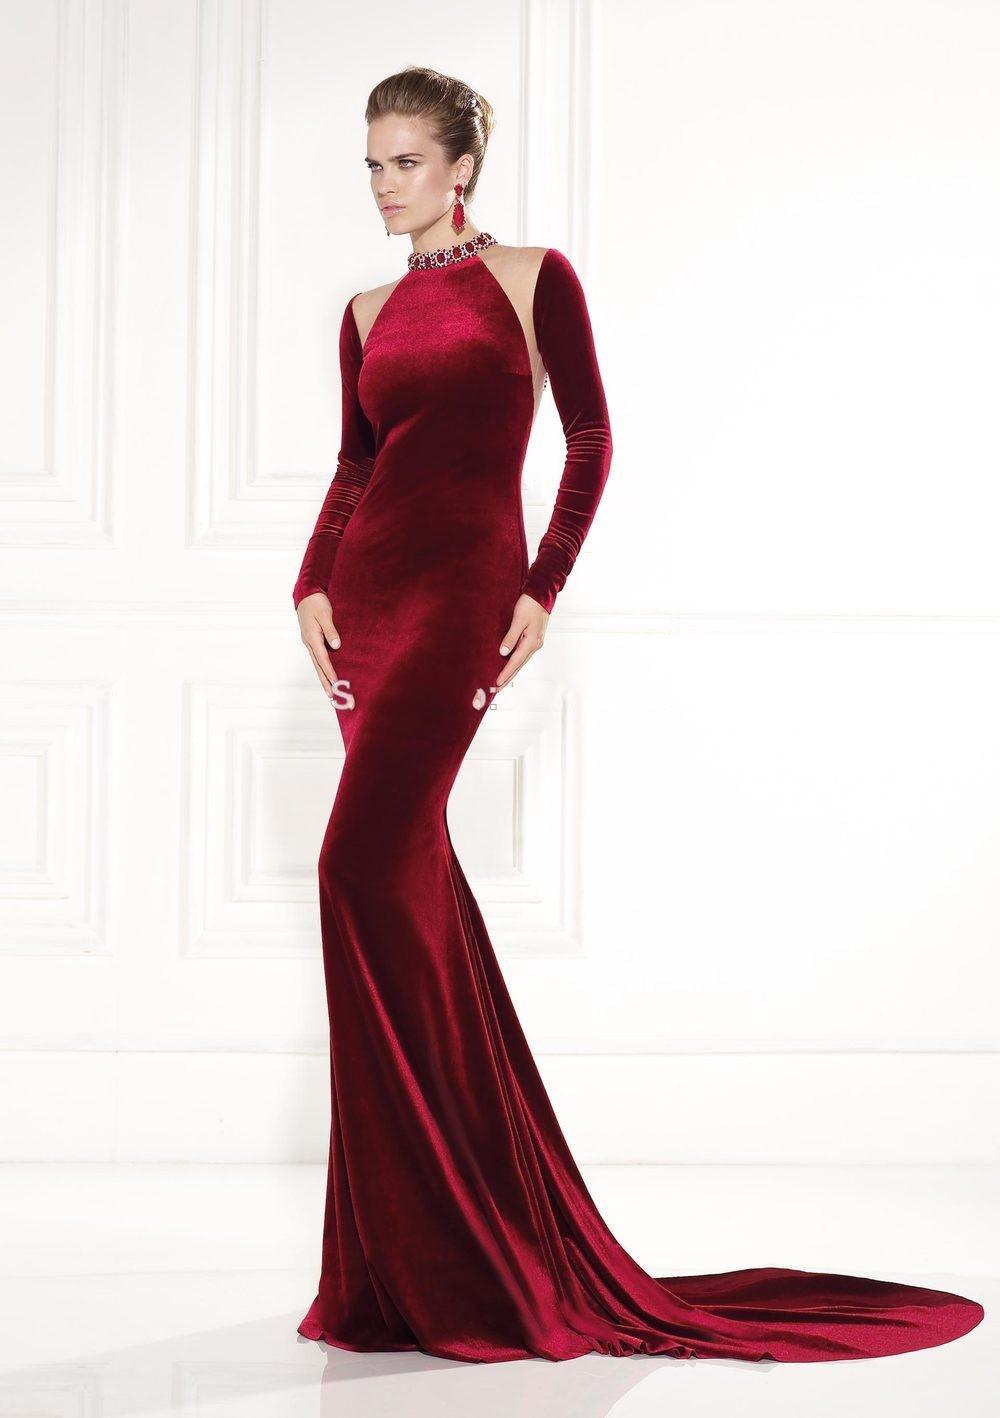 Burgundy Mermaid Beaded Long Sleeve Prom Gown New Years Eve 2017 Velvet Evening Dress Plus Size Robe De Soiree Alibaba On Aliexpress